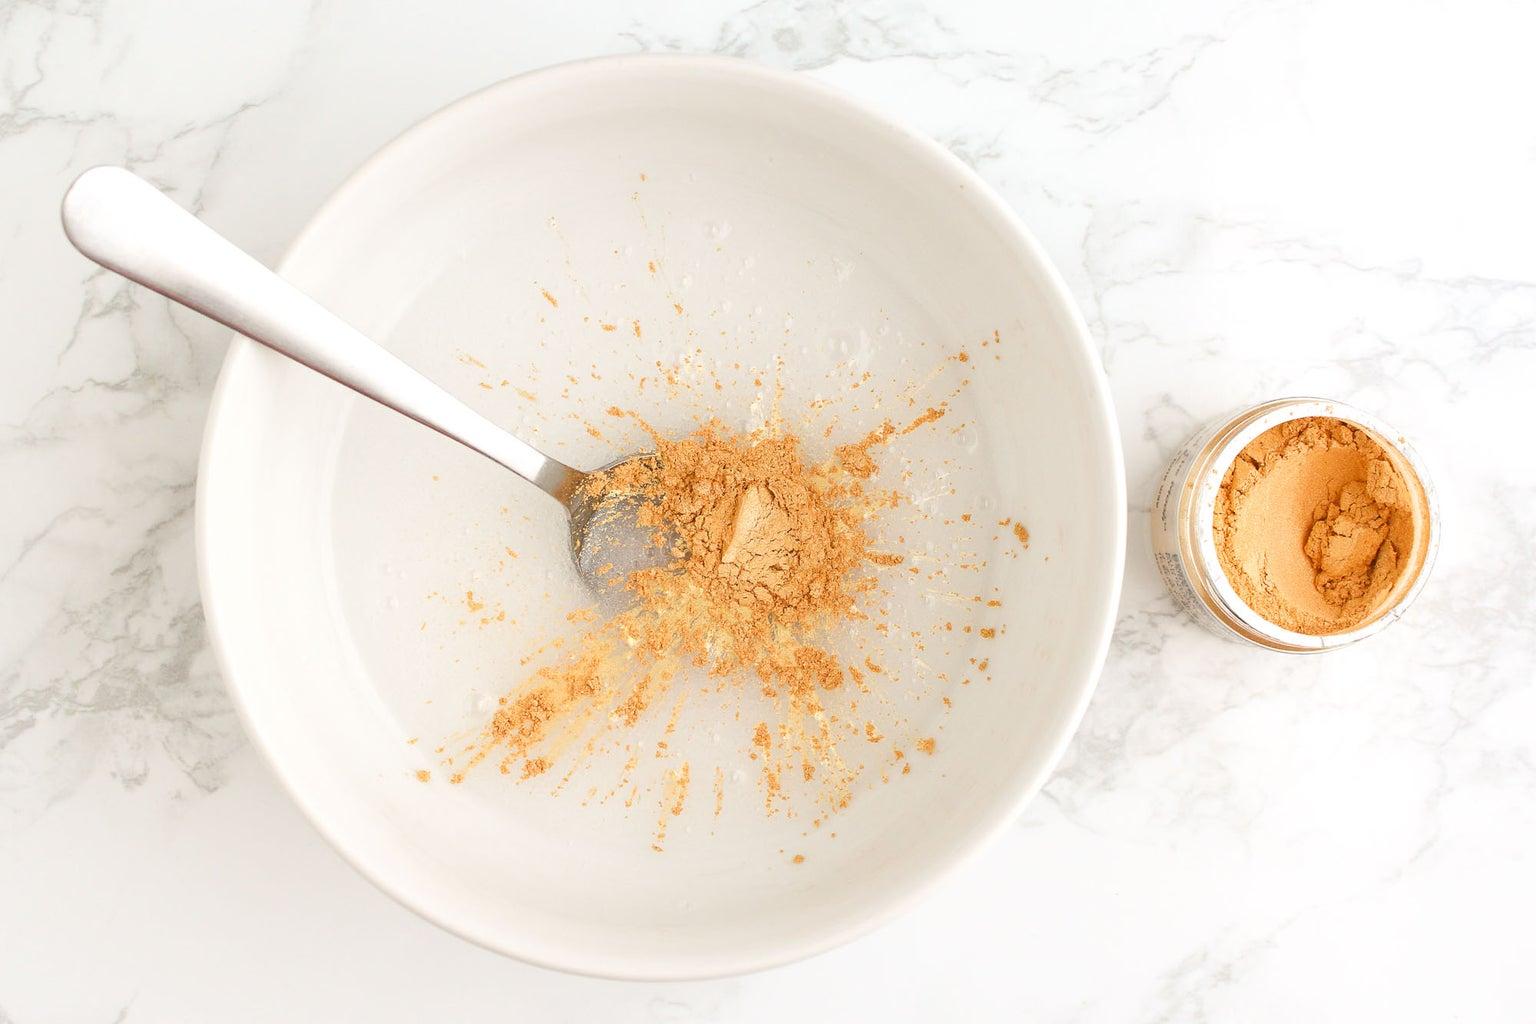 Add in the Golden Mica Powder